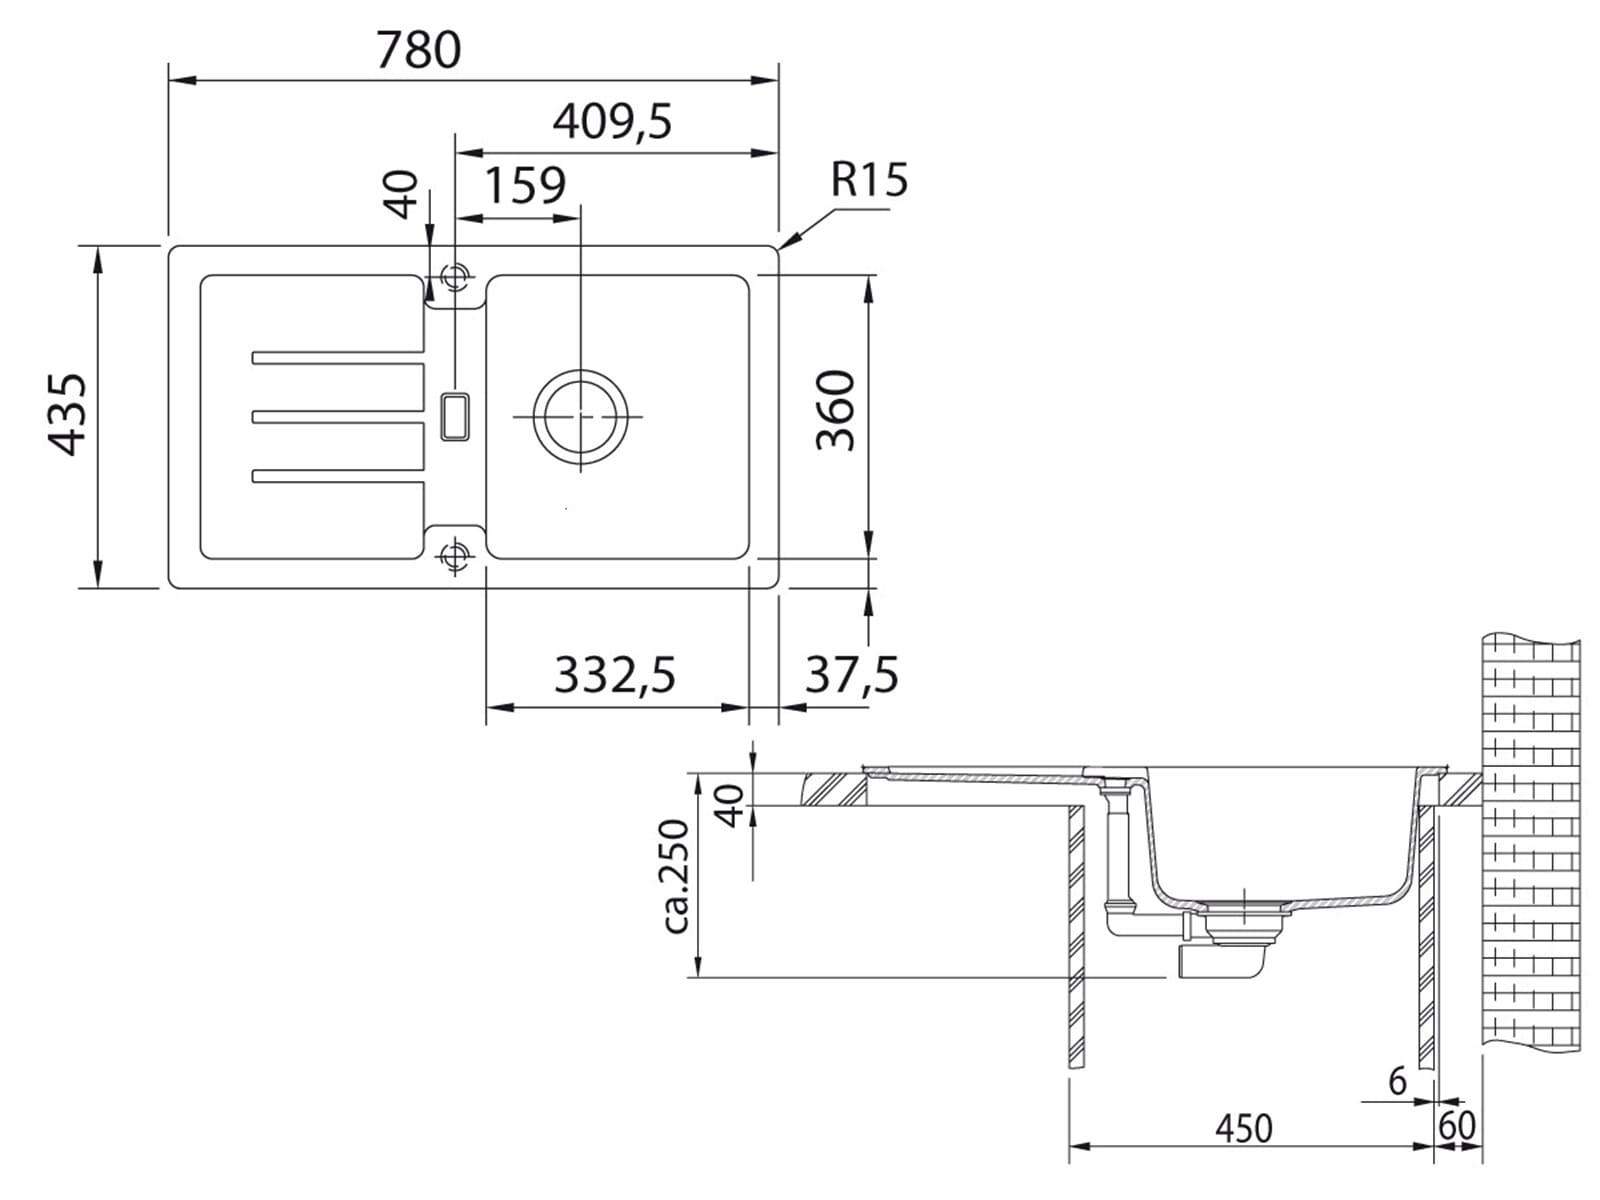 Franke Strata STG 614-78 Graphit Granitspüle Exzenterventil